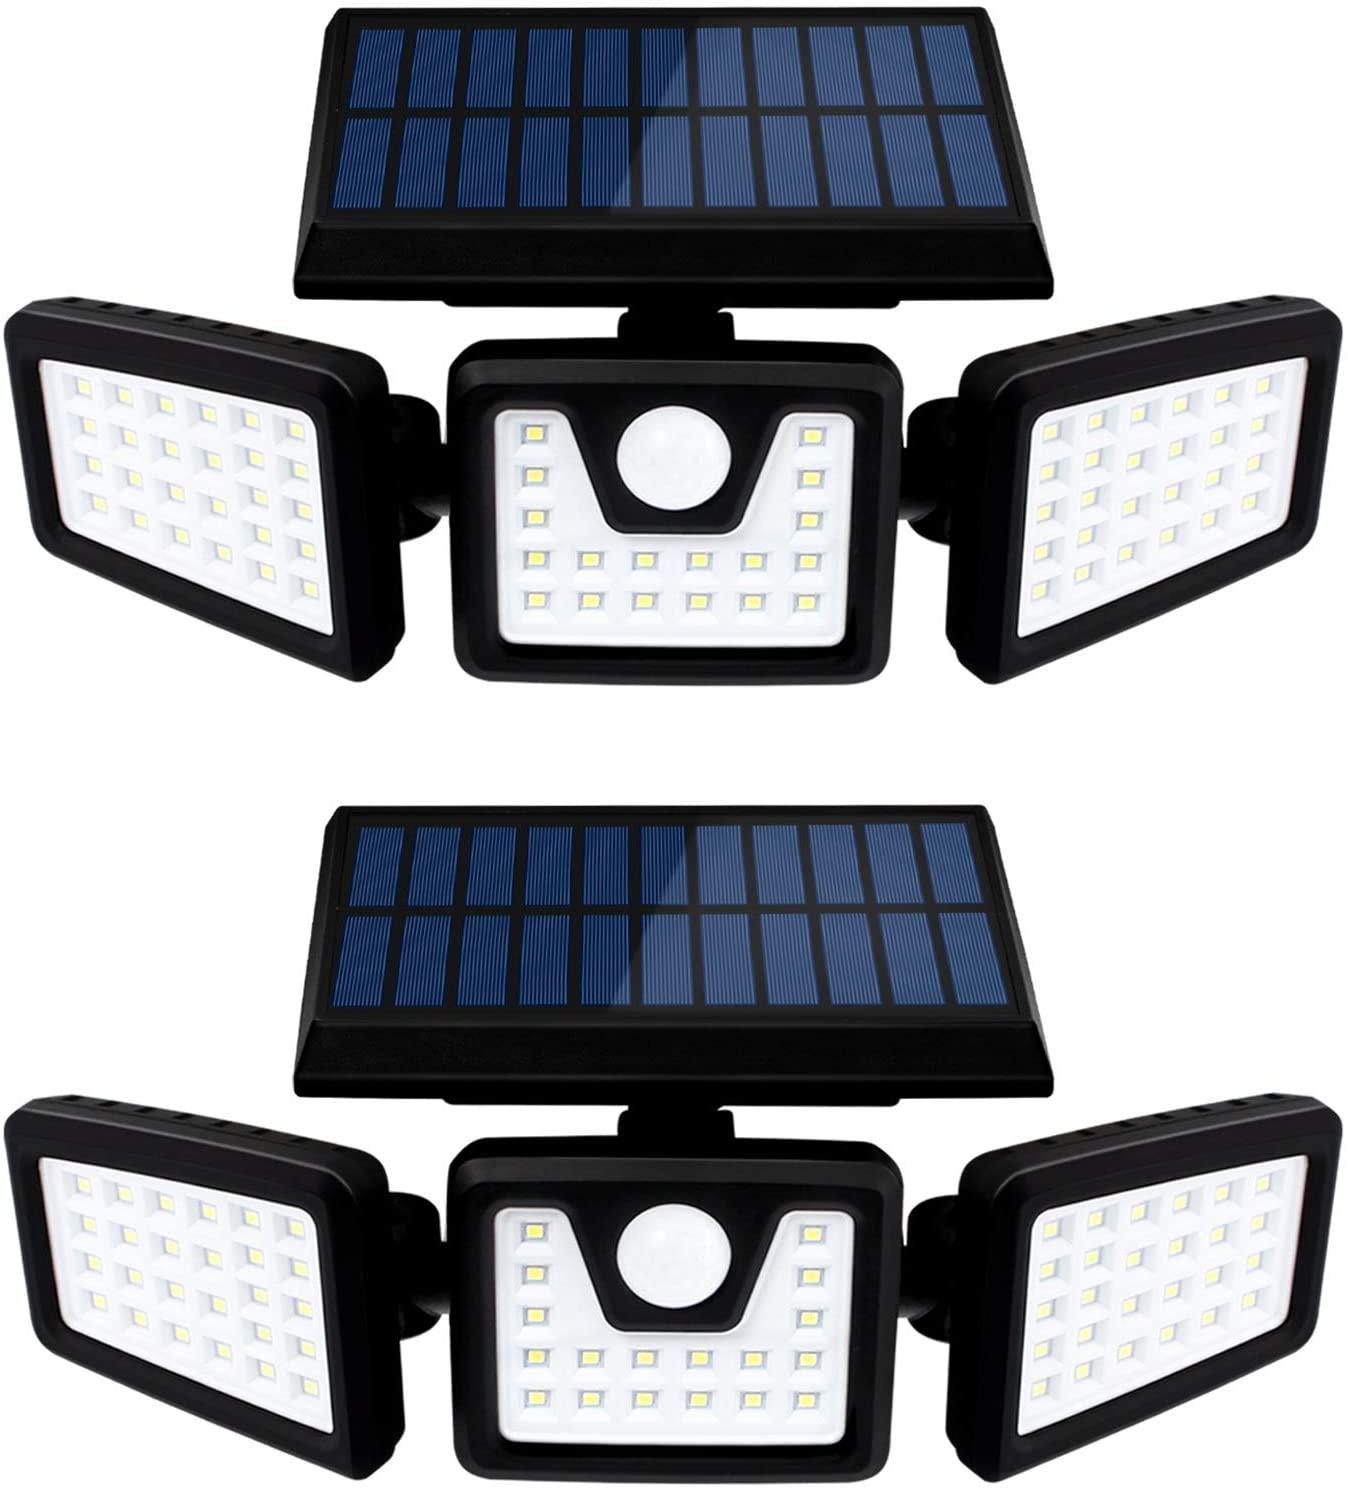 Otdair Waterproof Rotatable 70 LED Security Lights